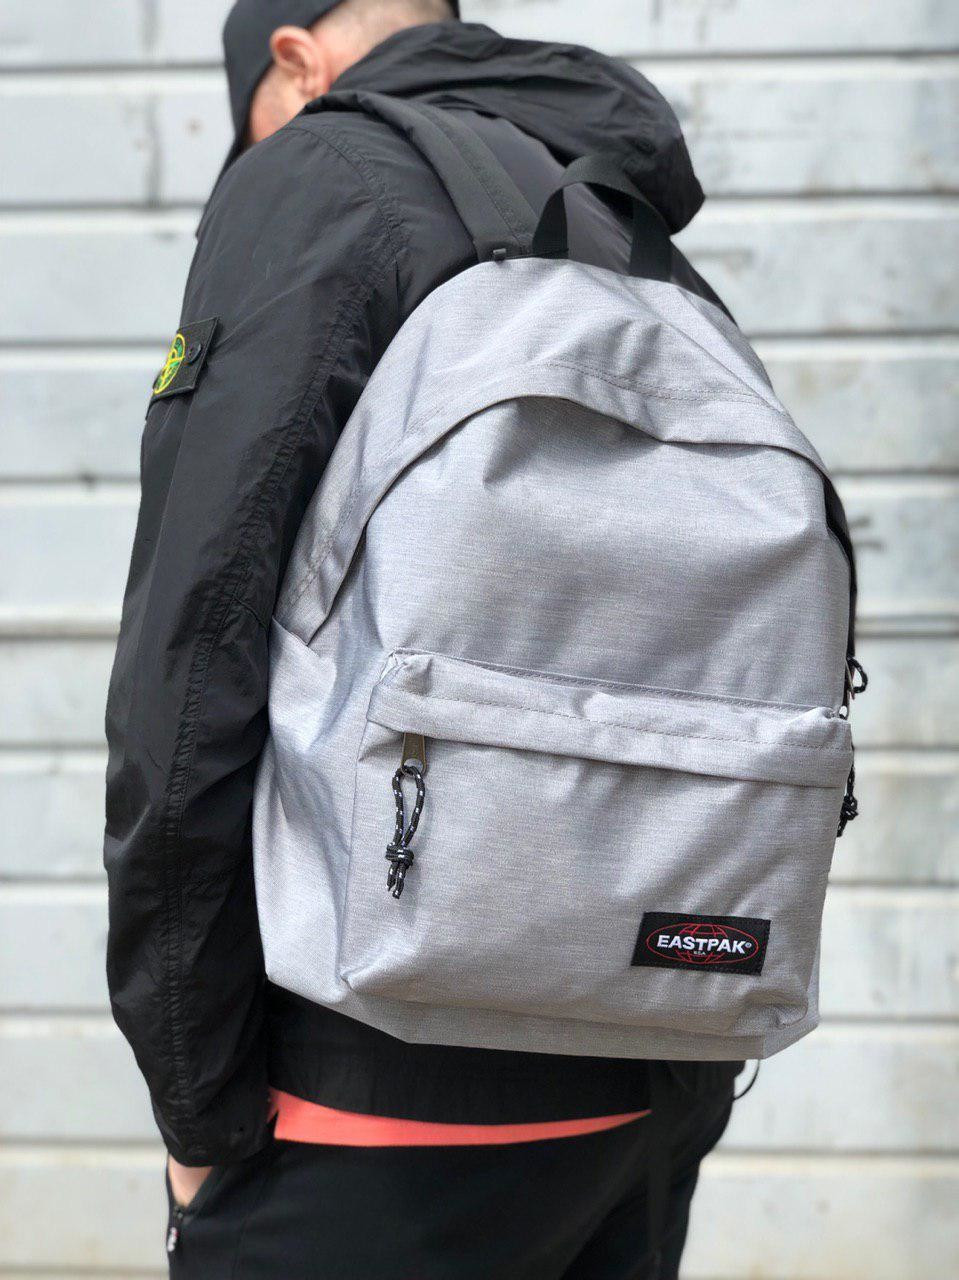 Рюкзак в стиле Eastpak светло-серый